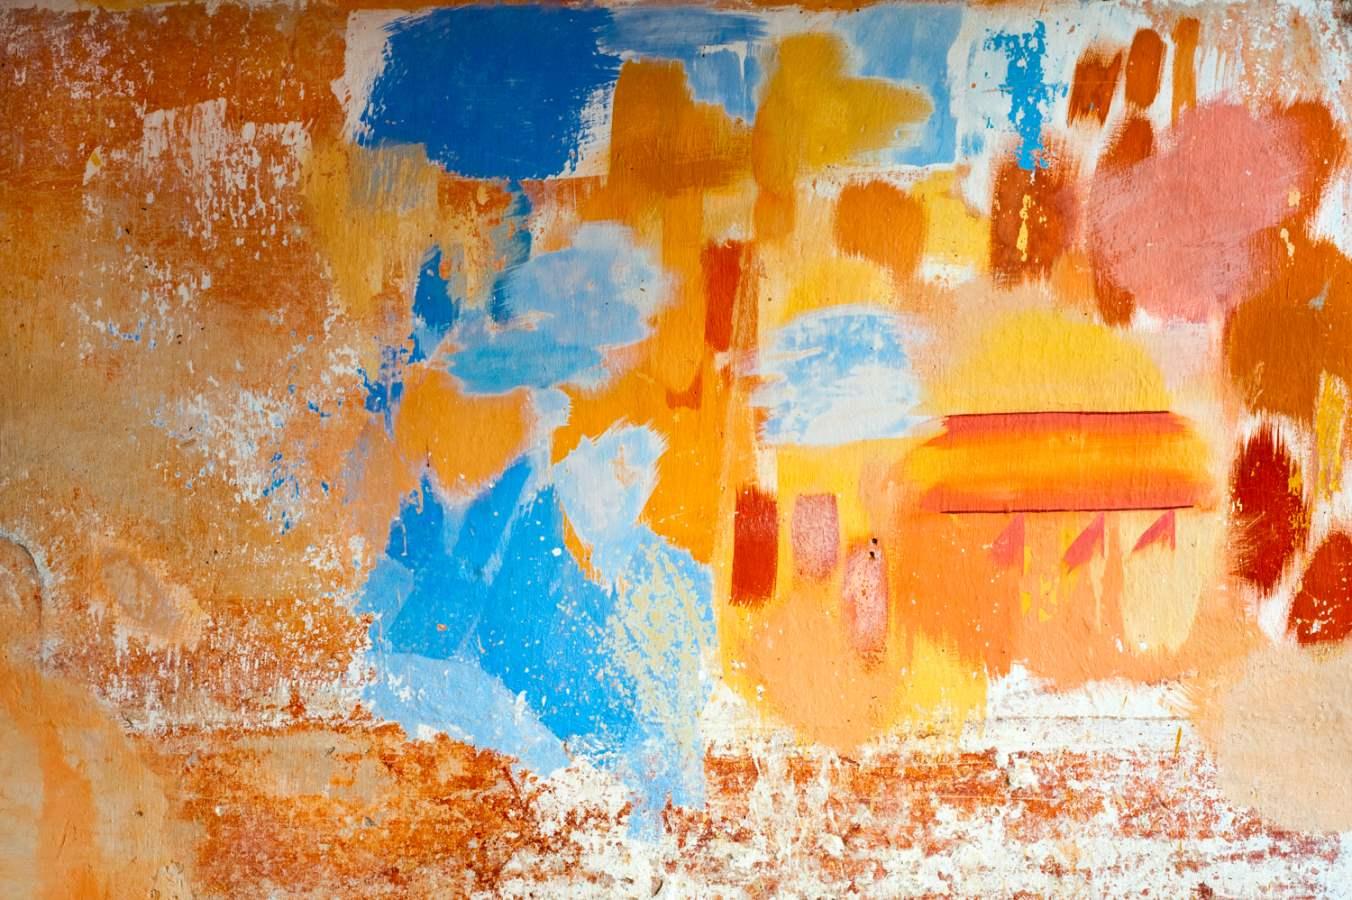 Trancas II 2009 R1 by  Alison Shaw - Masterpiece Online